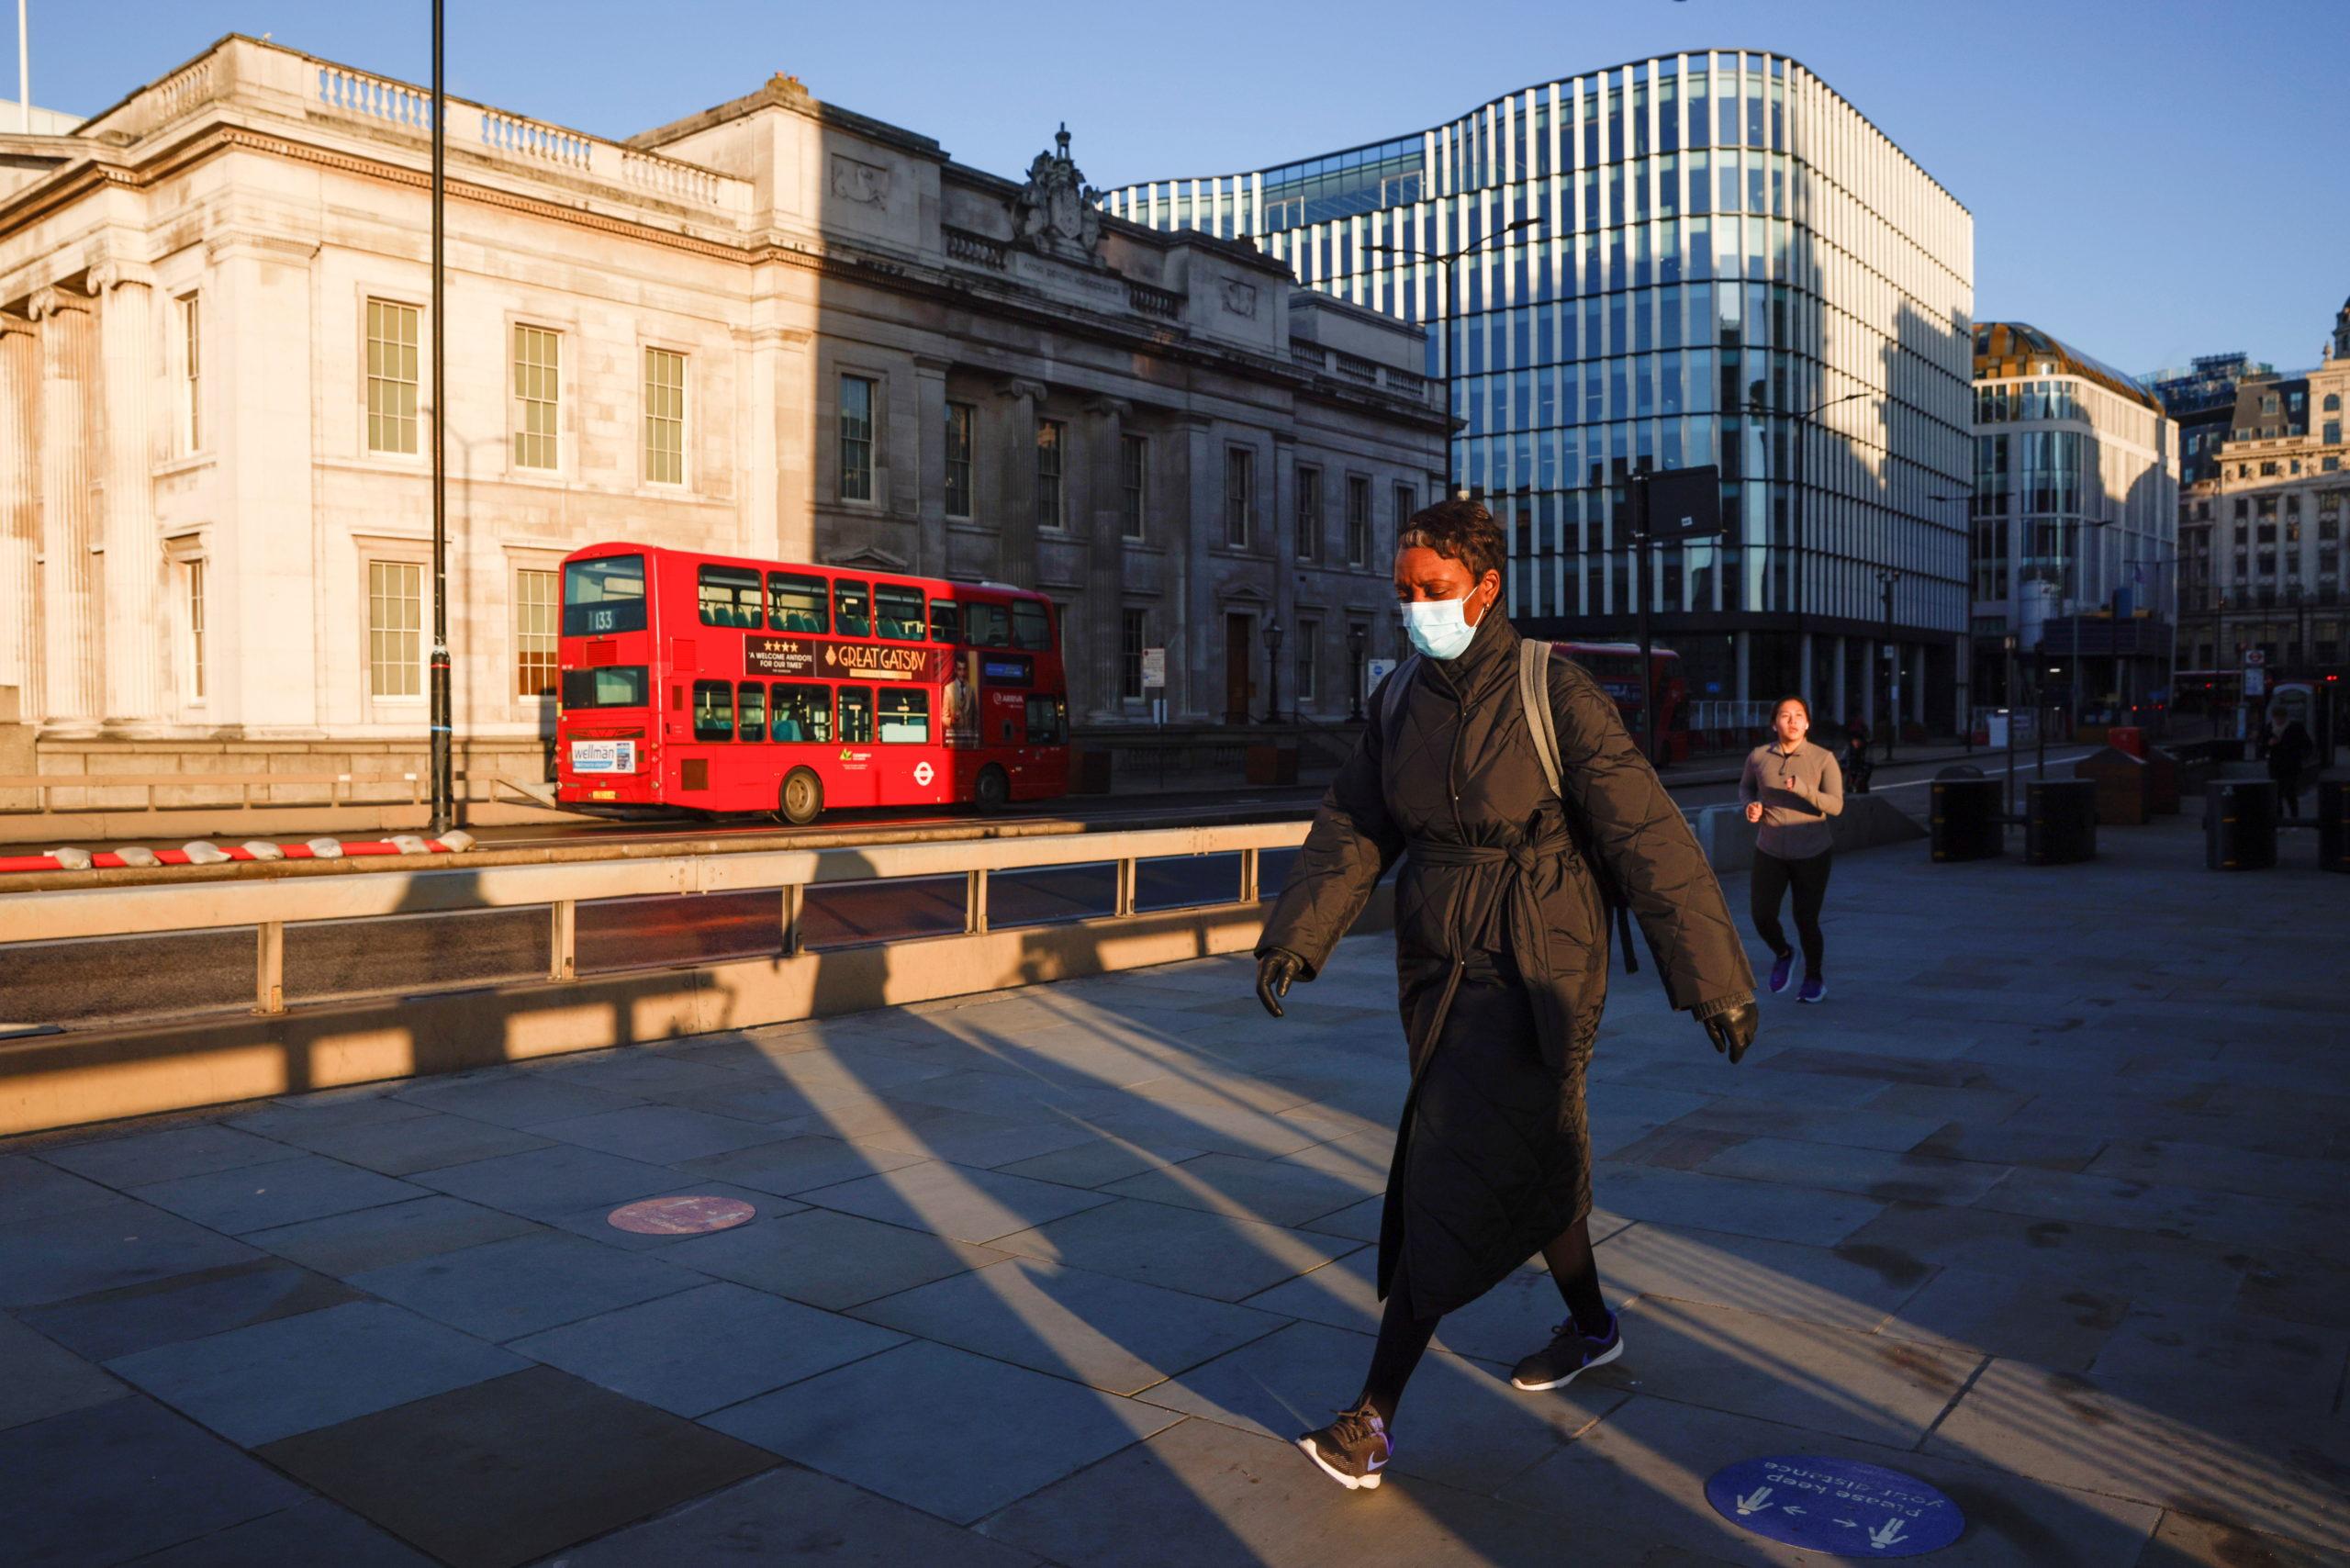 La Grande-Bretagne abaisse son niveau d'alerte au coronavirus